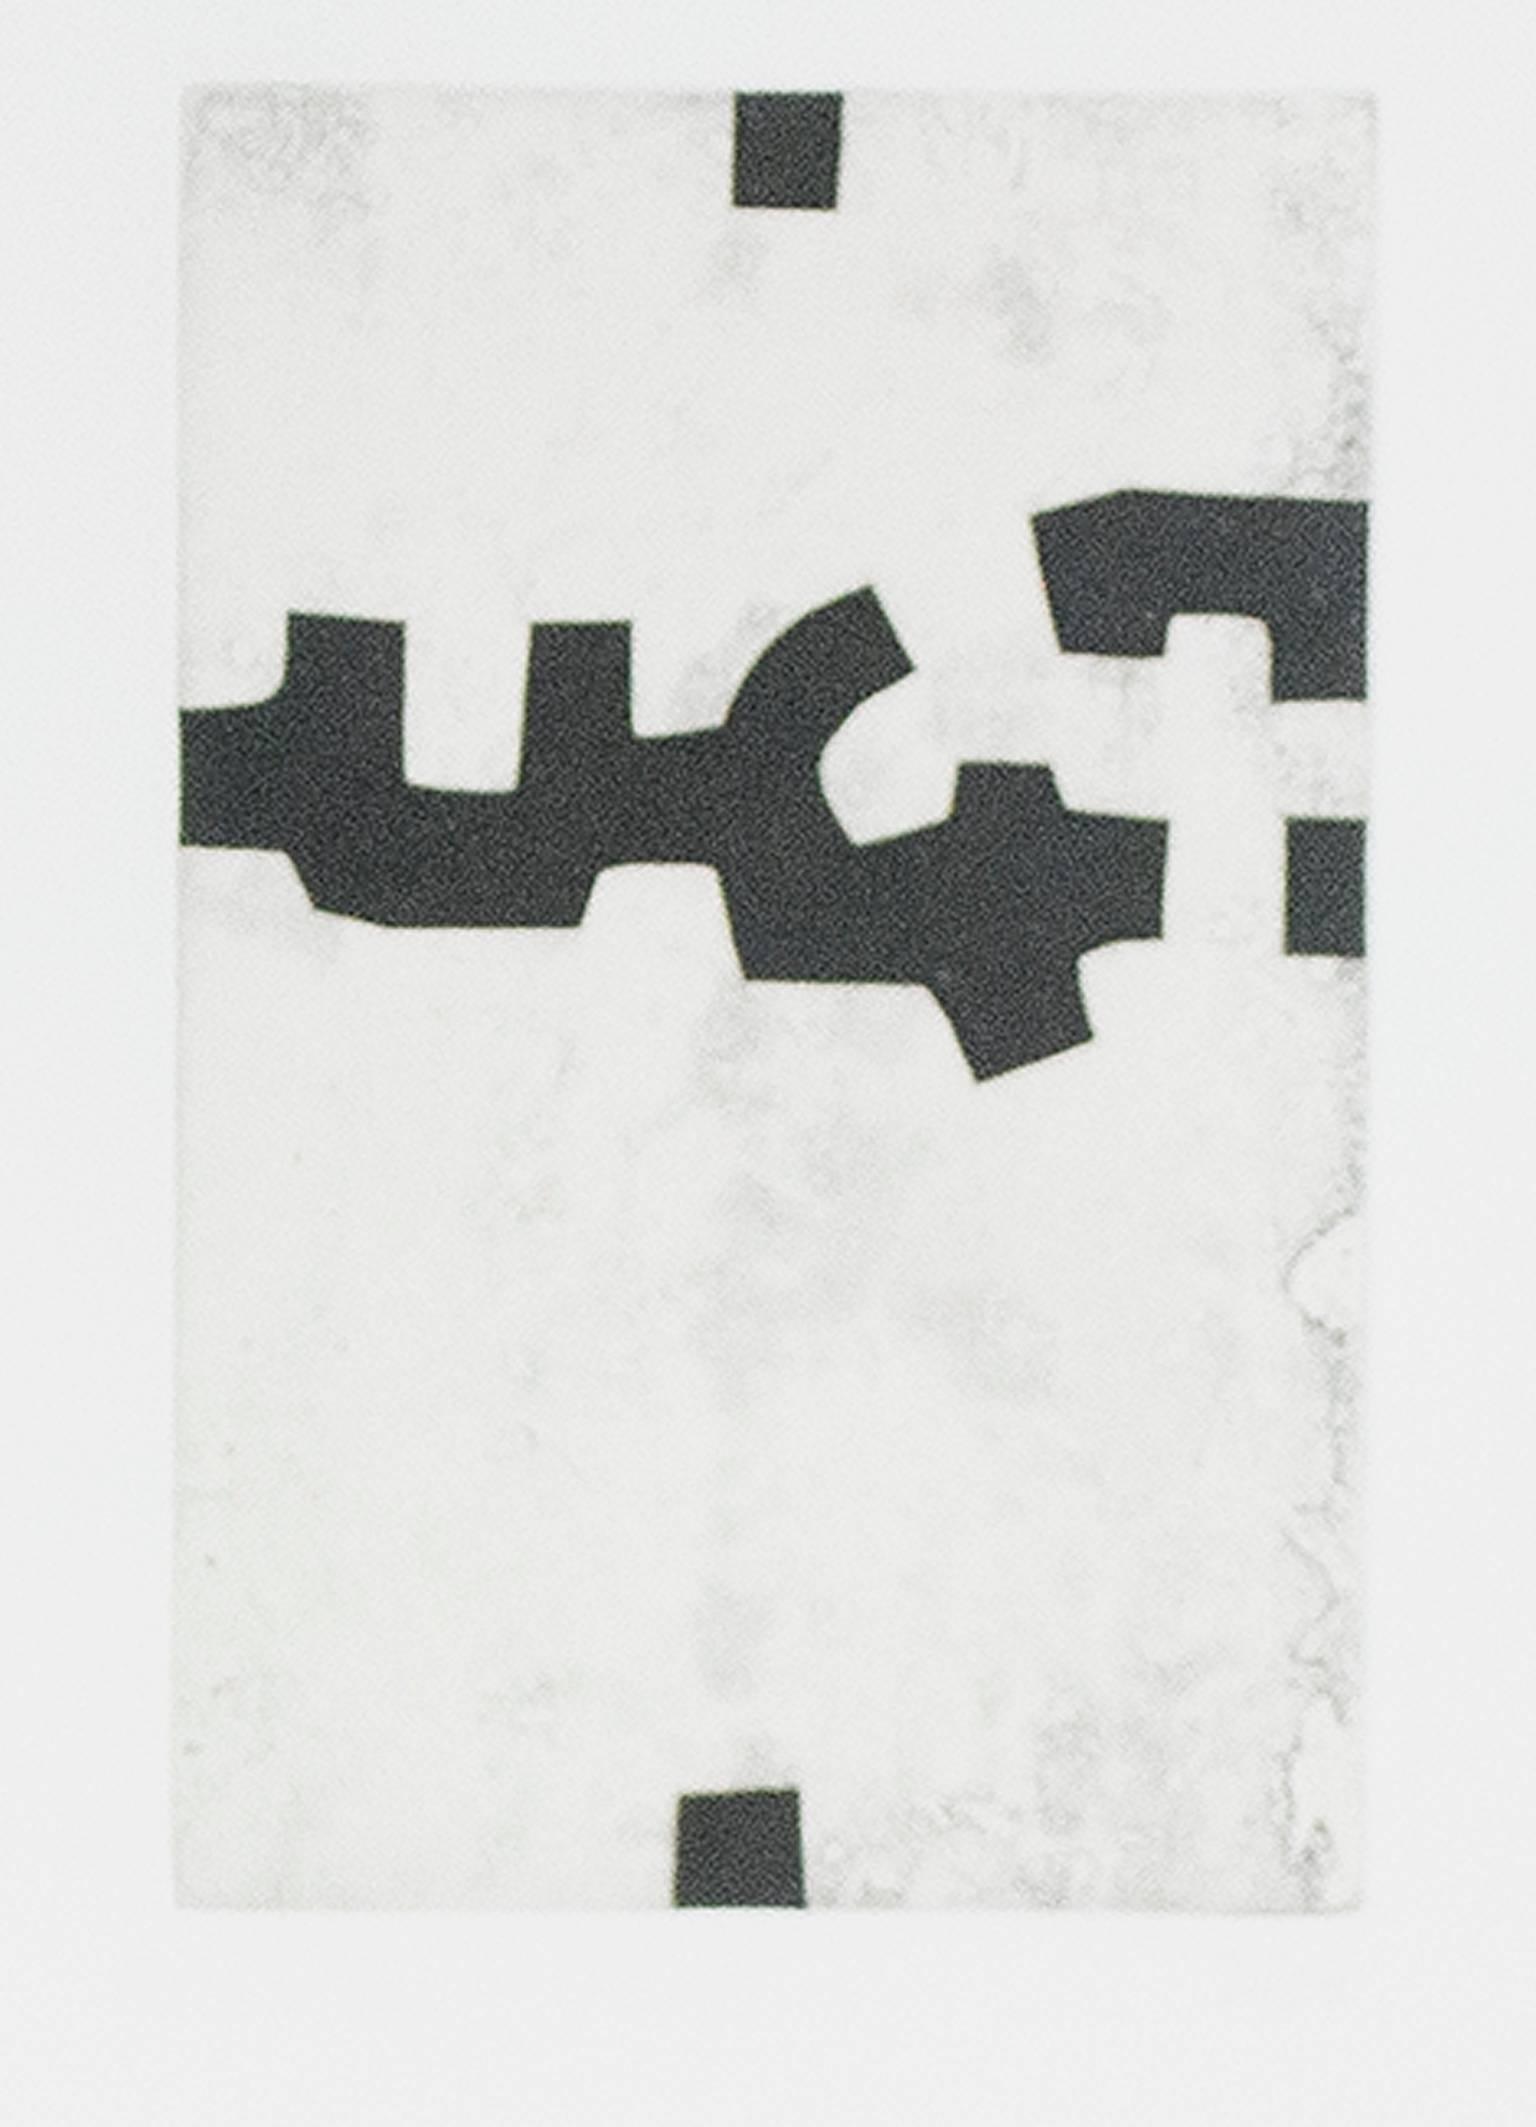 Emparatza (Edition 31/50)